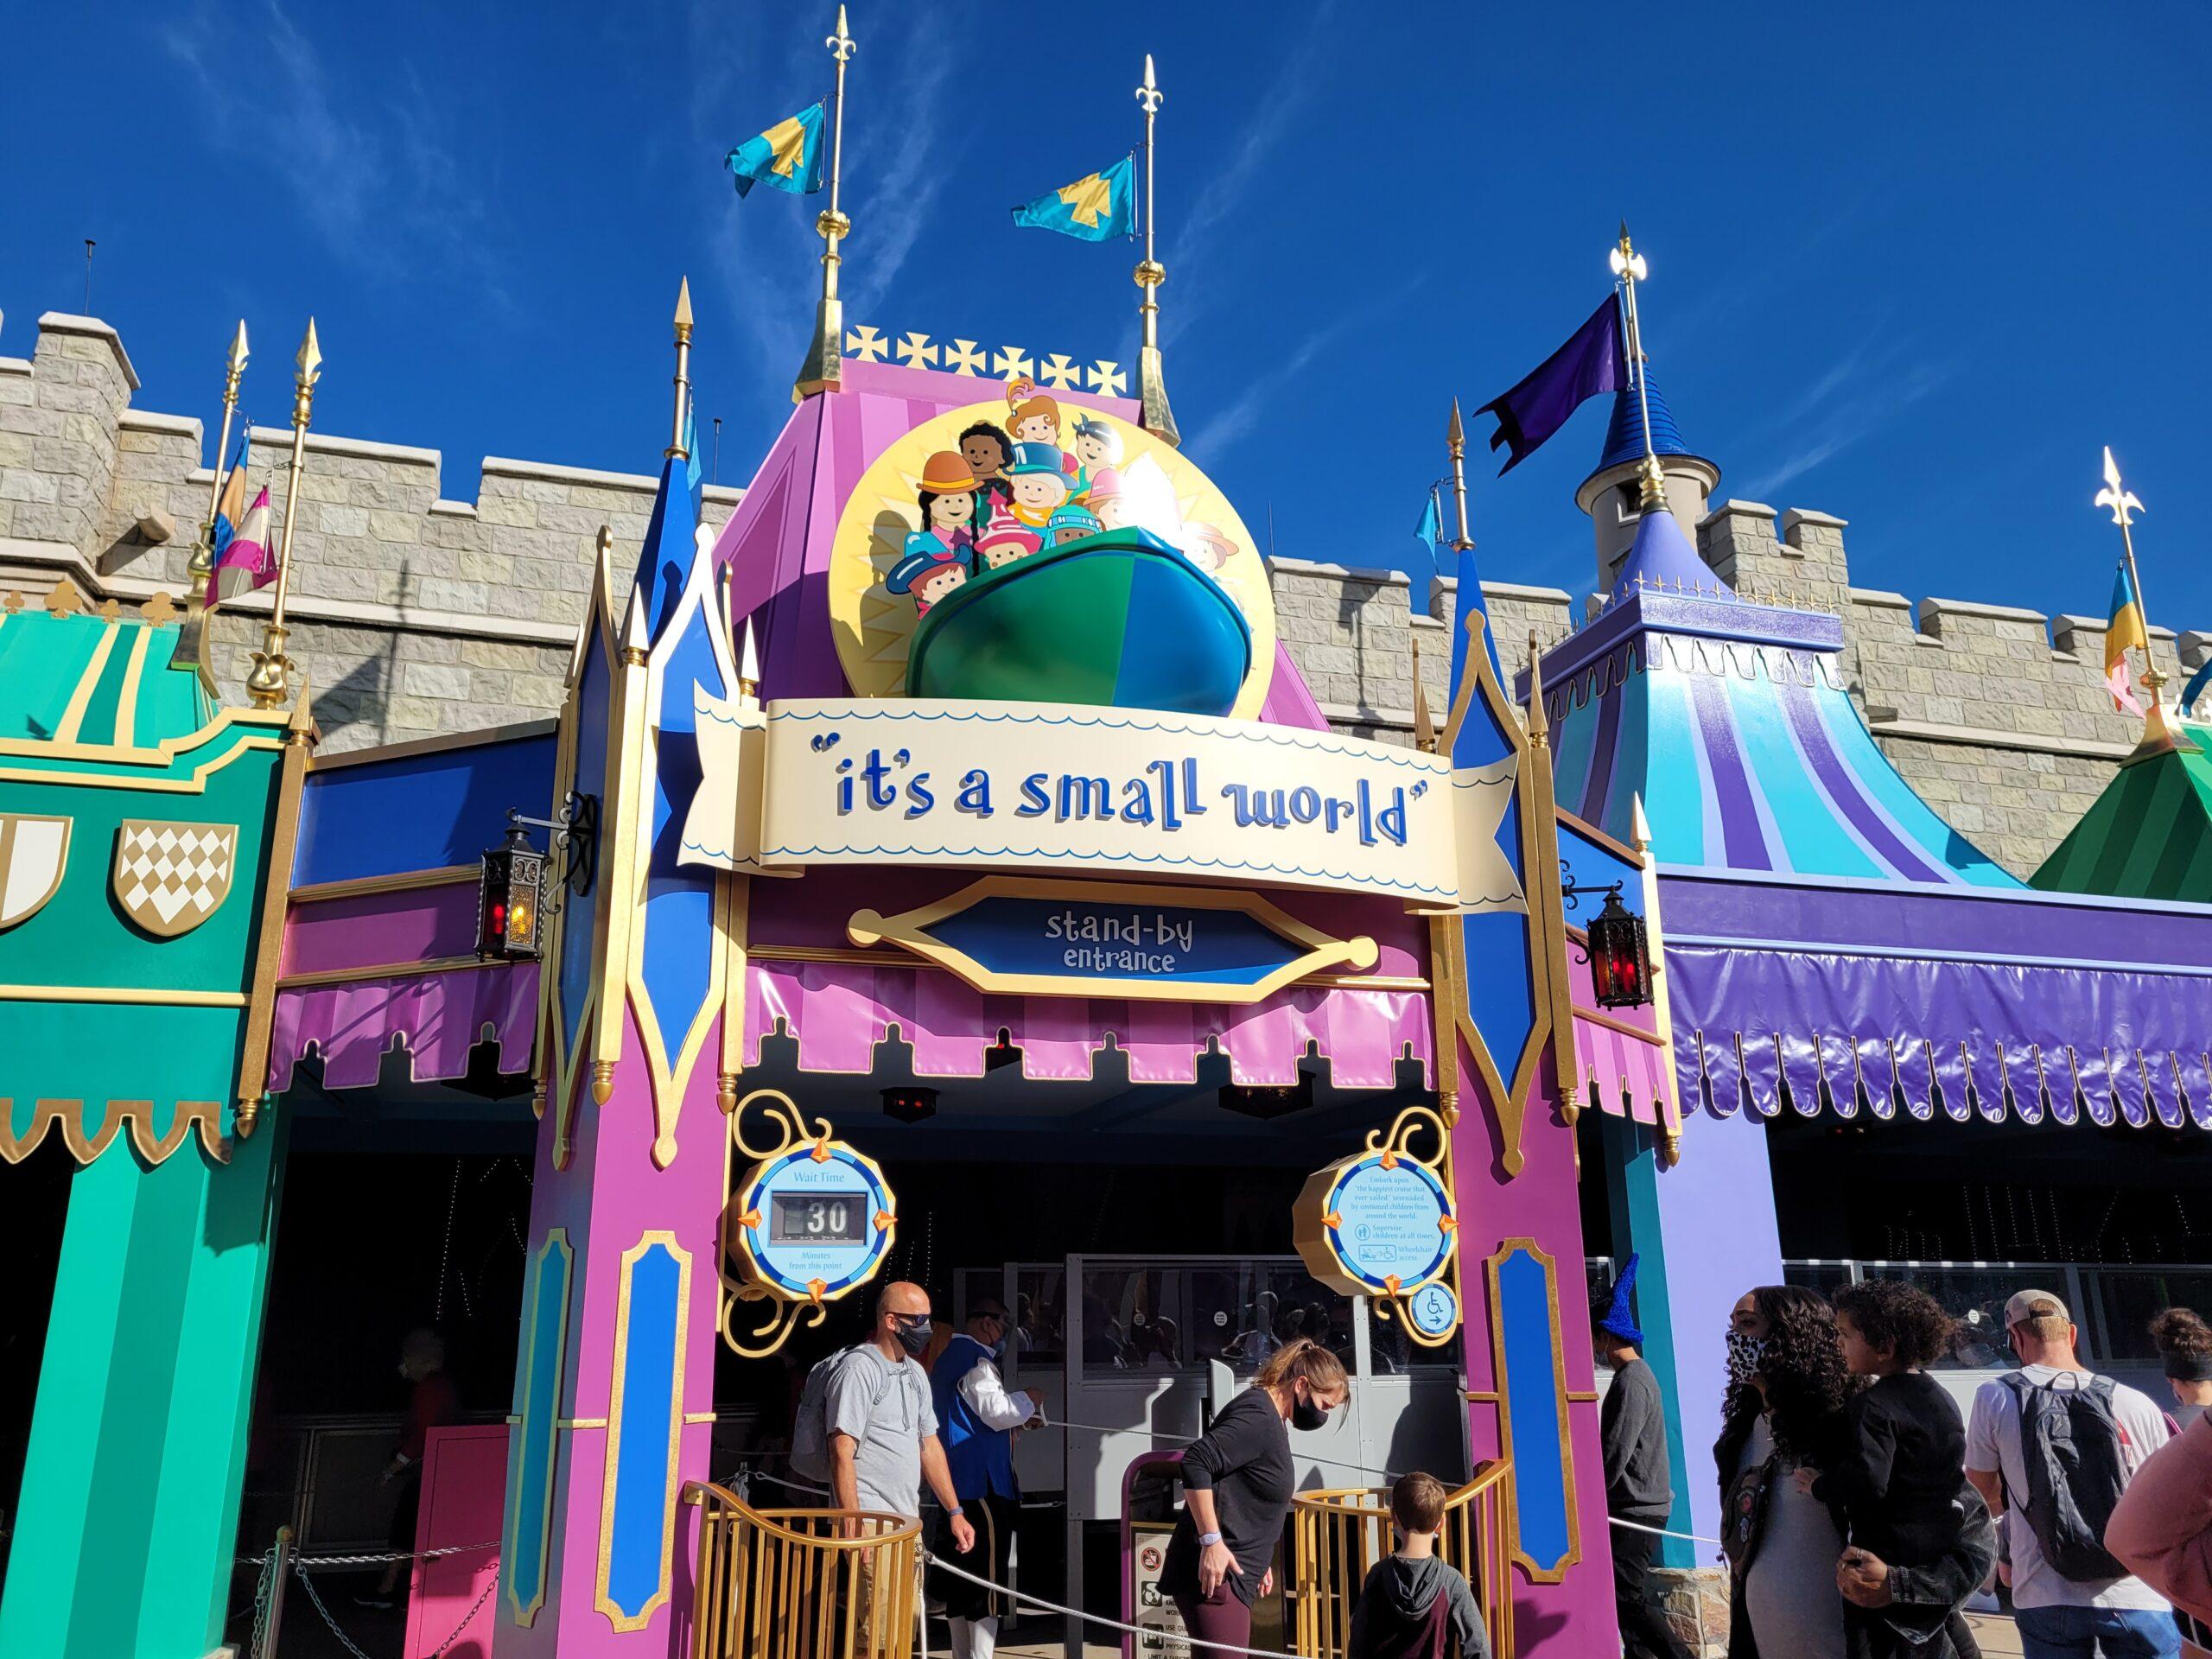 it's a small world Sign at Magic Kingdom